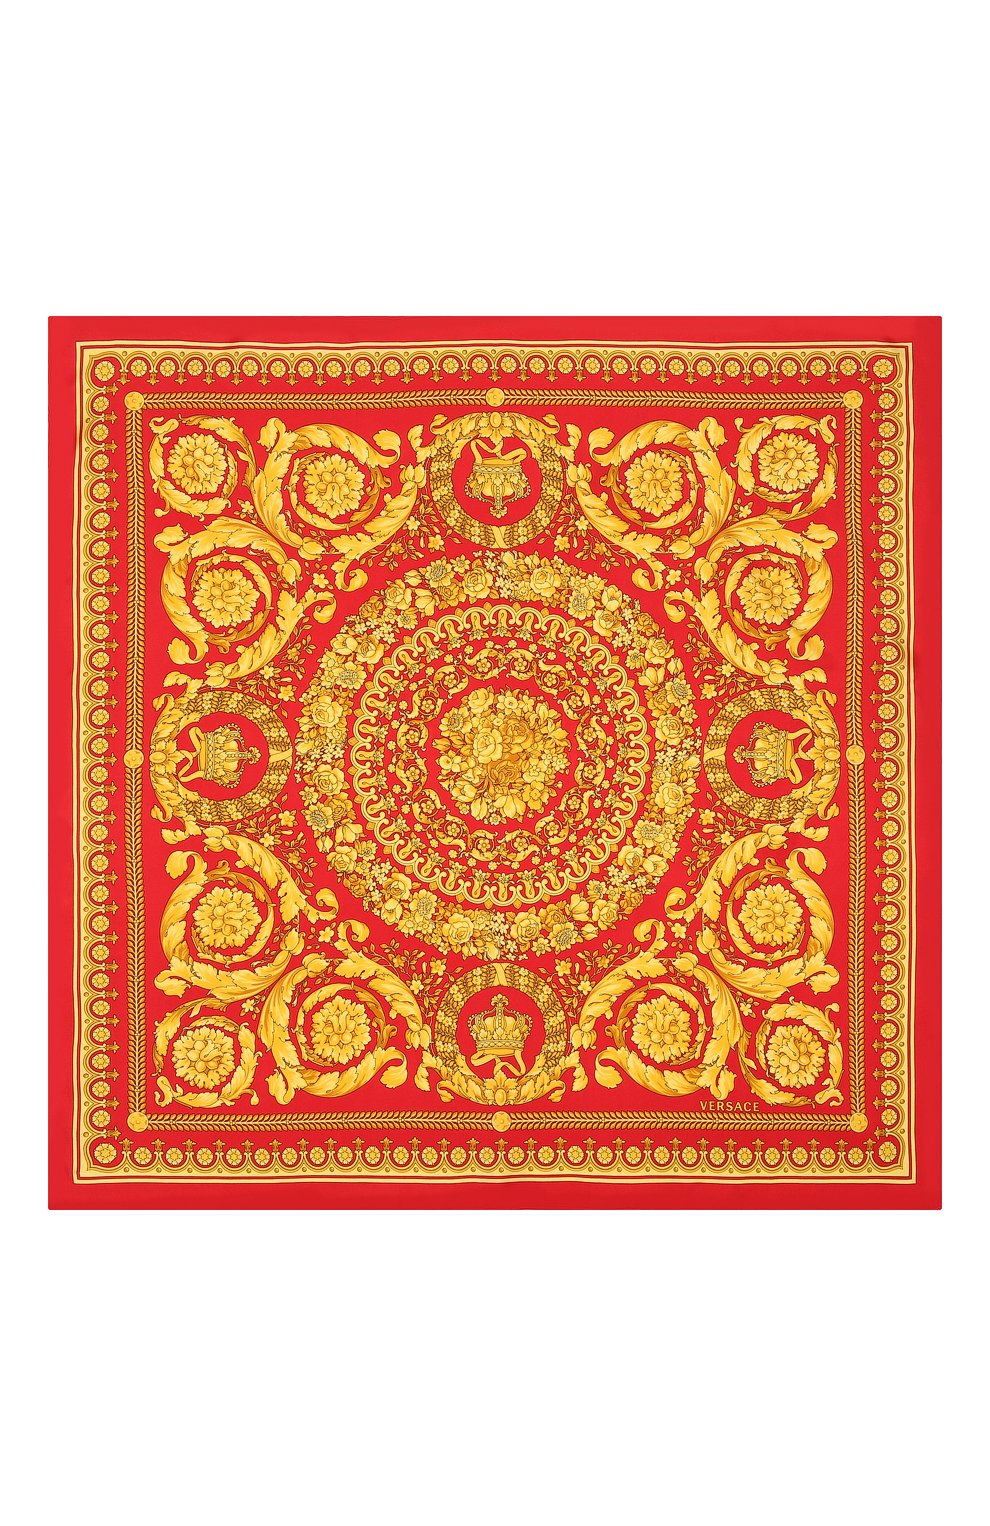 платок женский 15049 шелк оранжевый